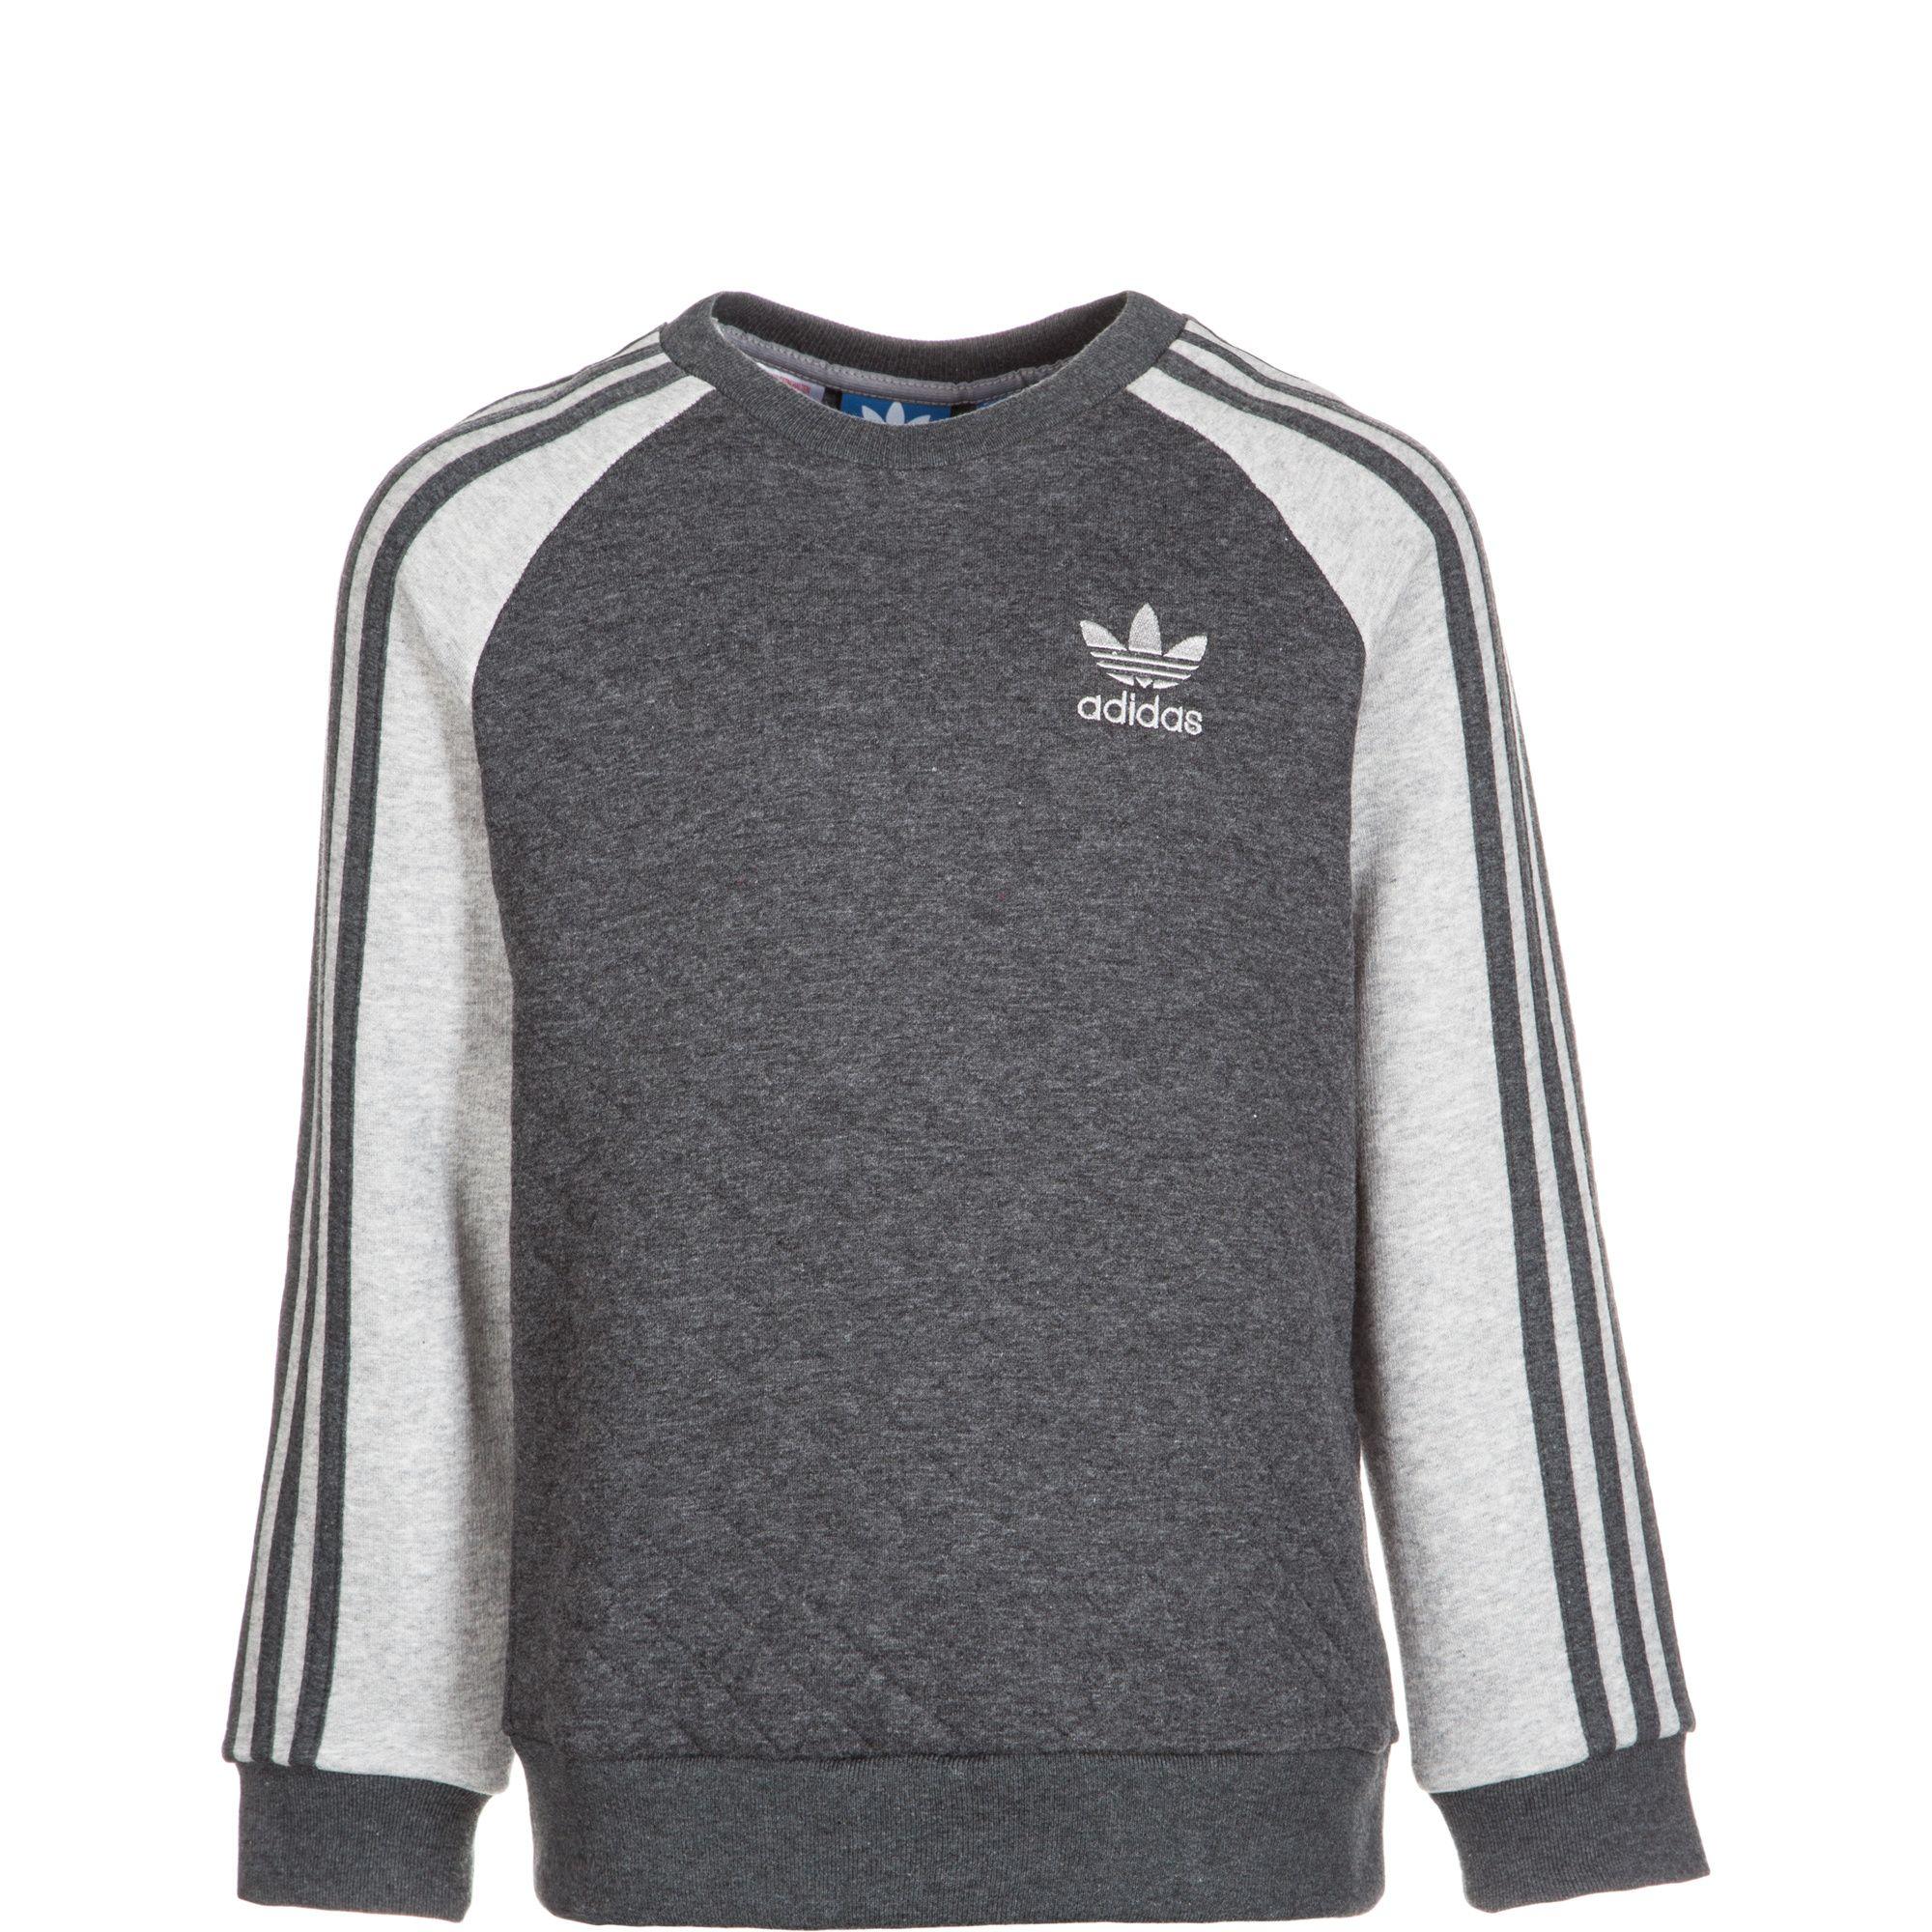 ADIDAS ORIGINALS adidas Originals Fleece Crew Sweatshirt Kinder